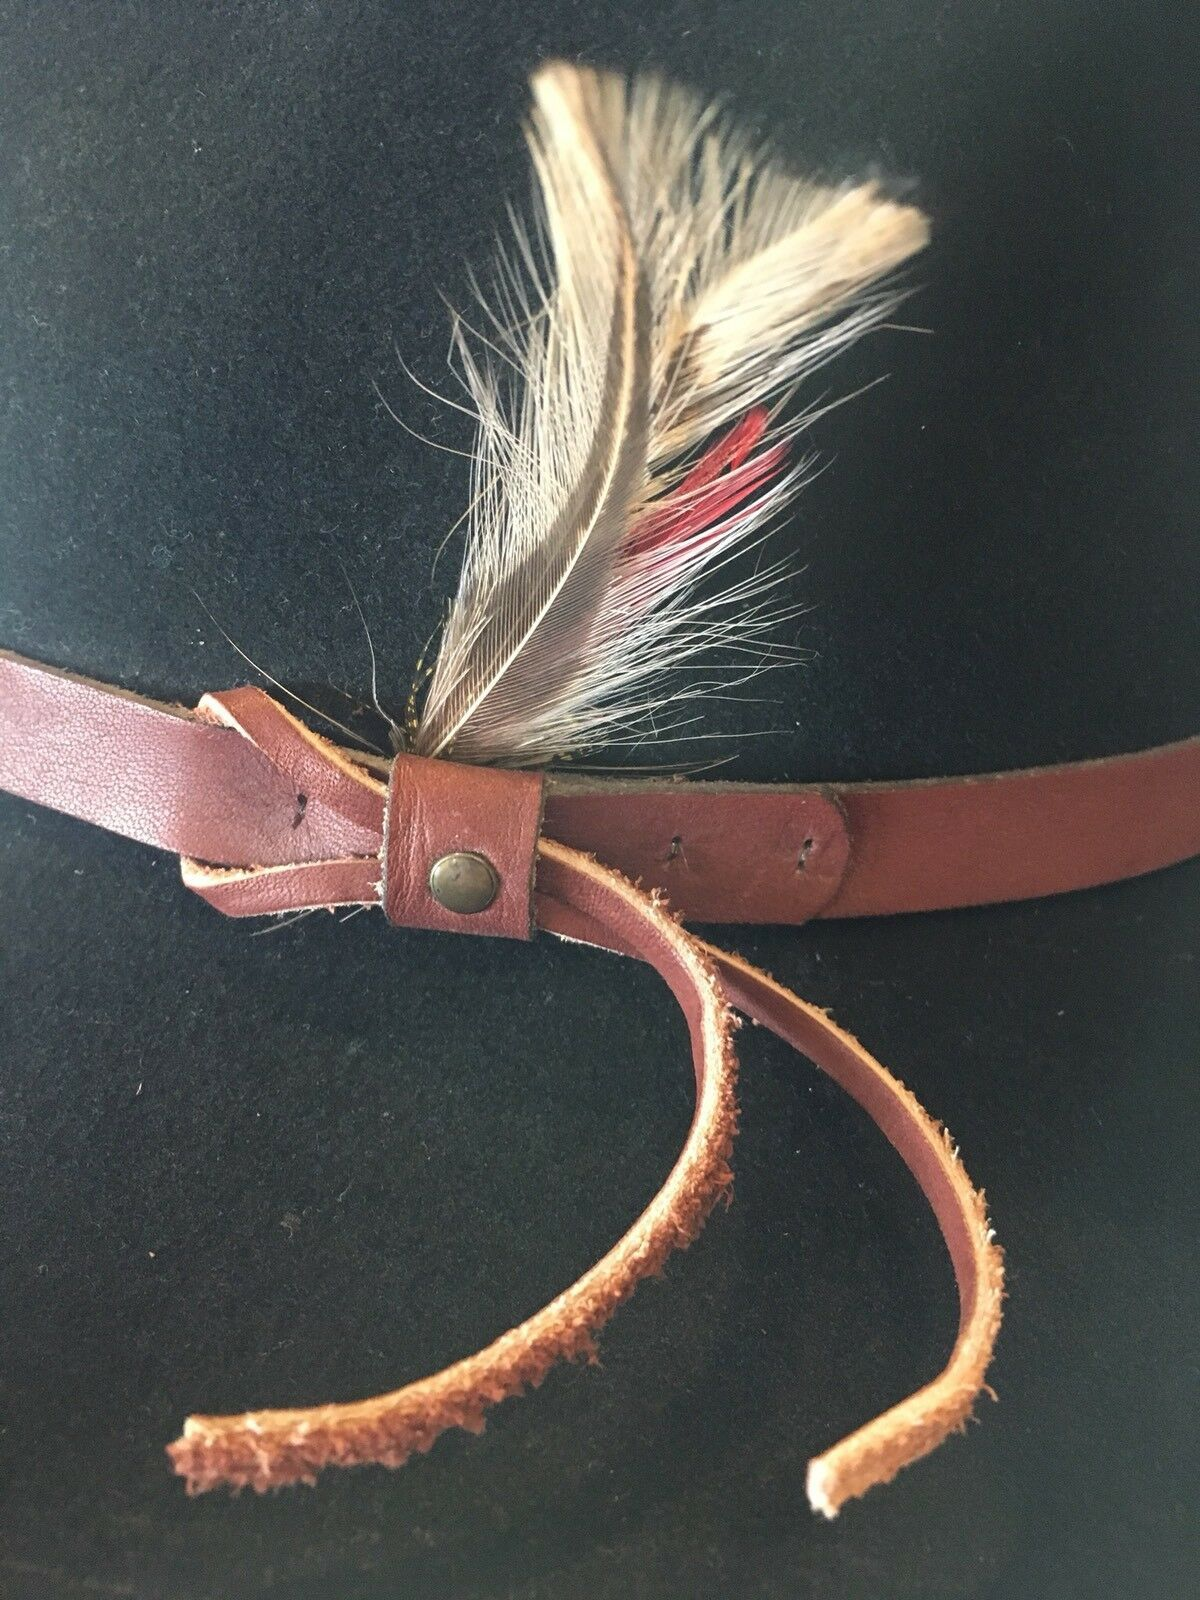 DORFMAN PACIFIC Fedora Black Wool Felt Velvet Hat Feather Sz M Brush Made USA image 8